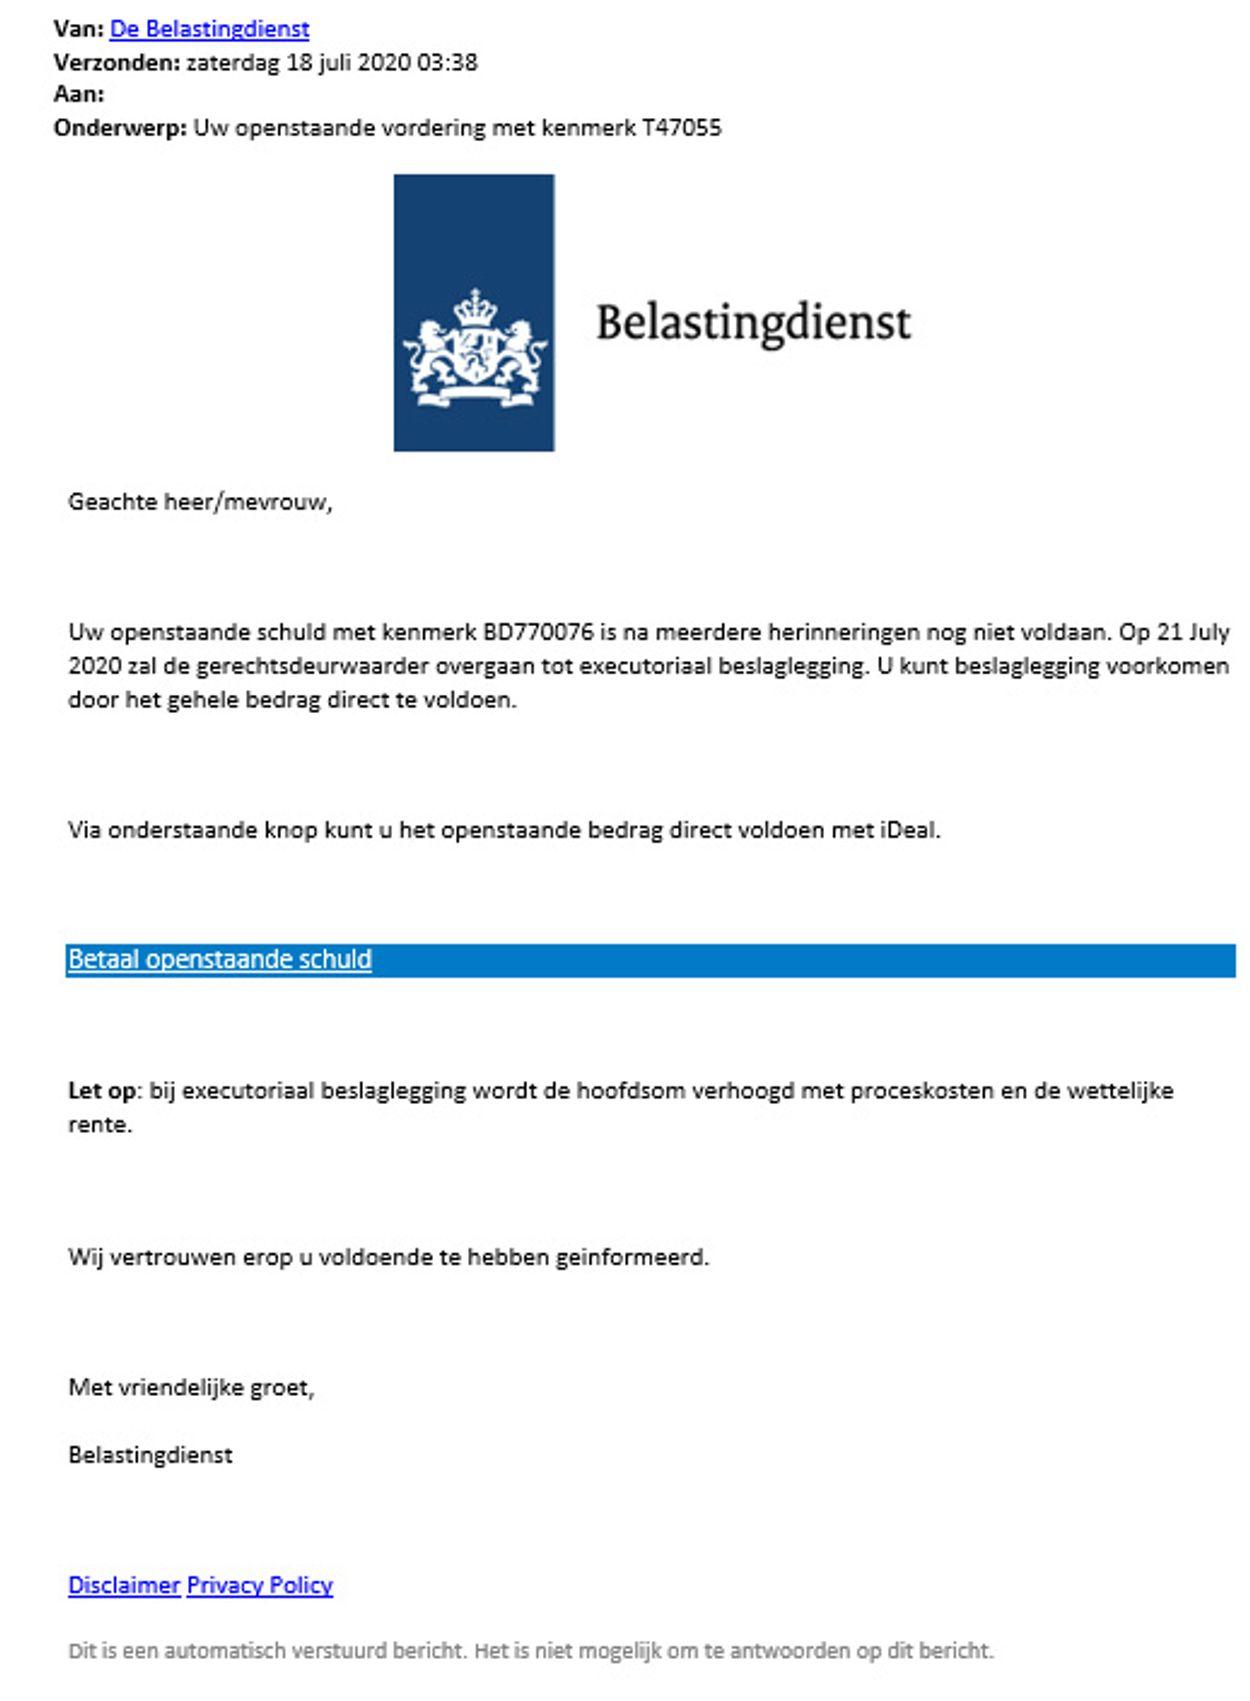 phishinmail belastingdienst 18 juli 2020_redactie